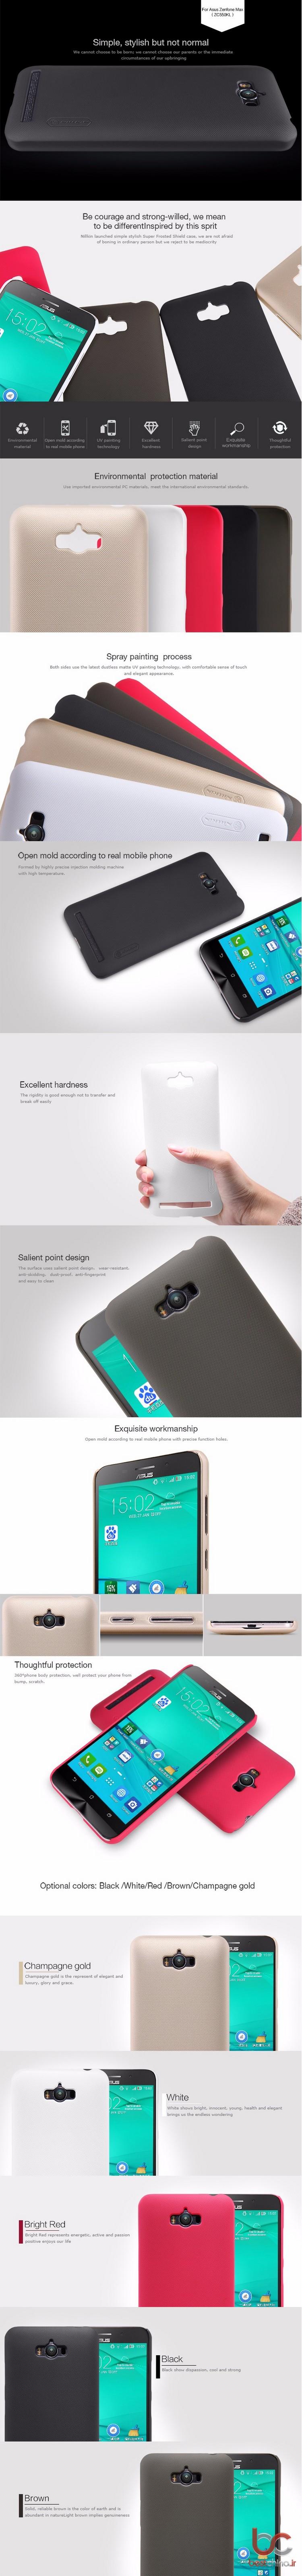 Asus ZenFone Max nilkin back cover (01)